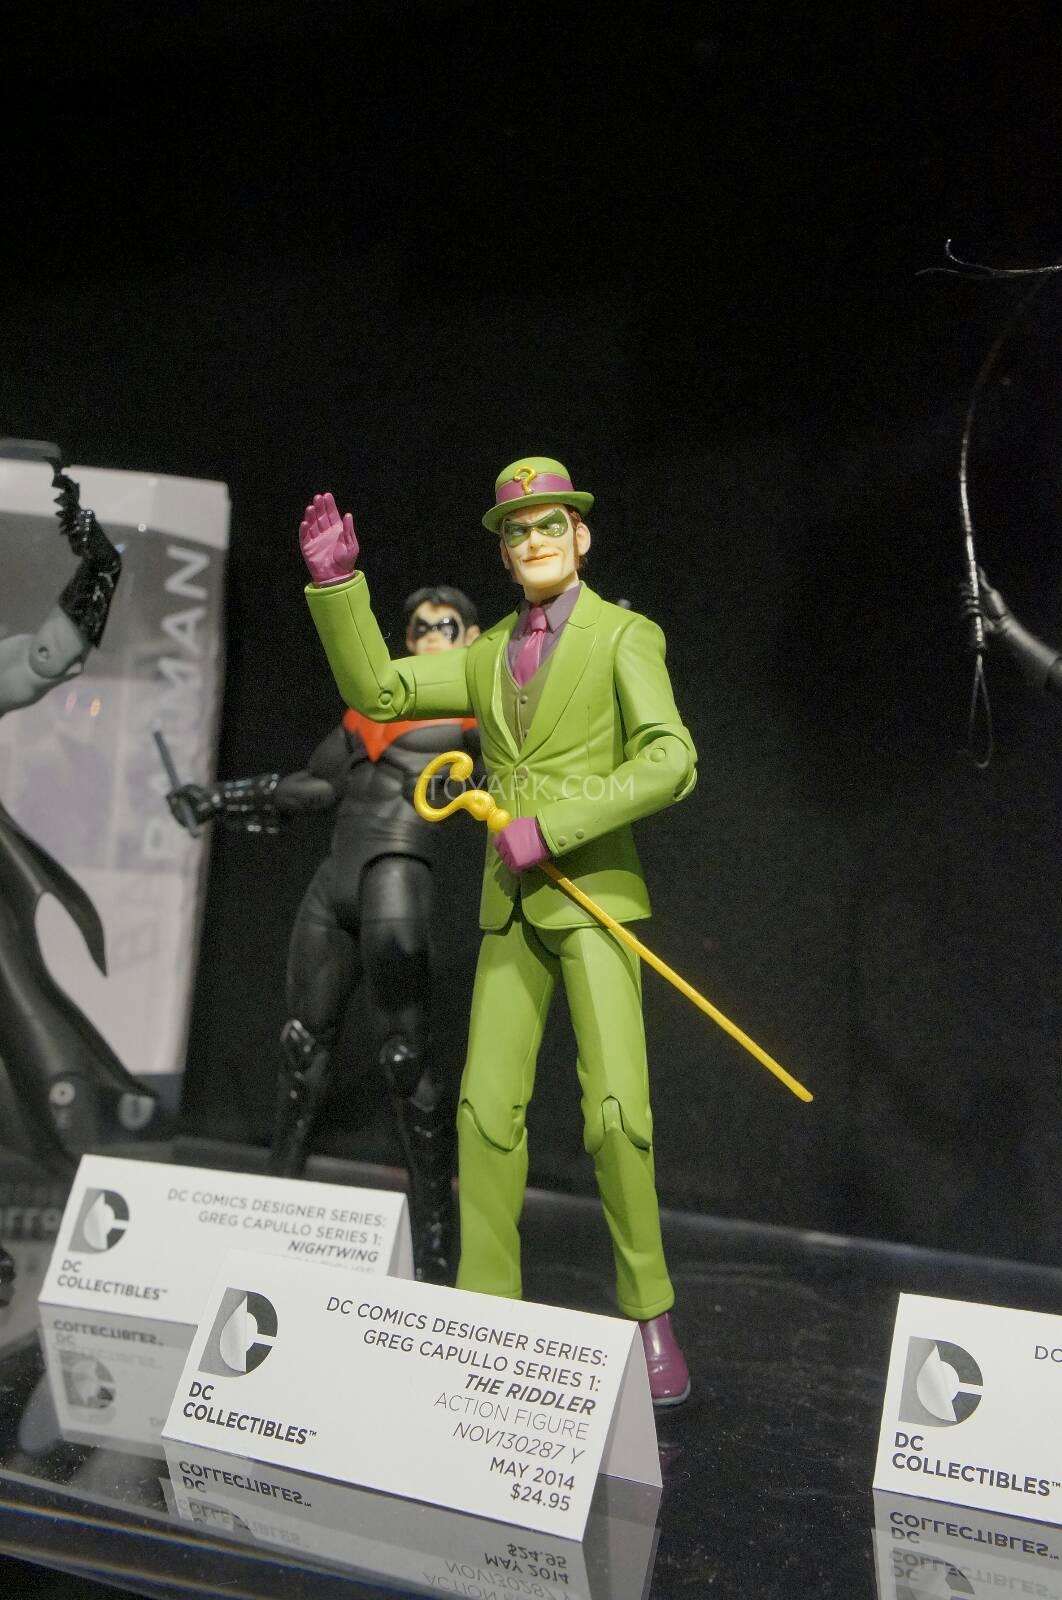 [Toy Fair 2014] DC Collectibles Toy-Fair-2014-DC-Collectibles-097